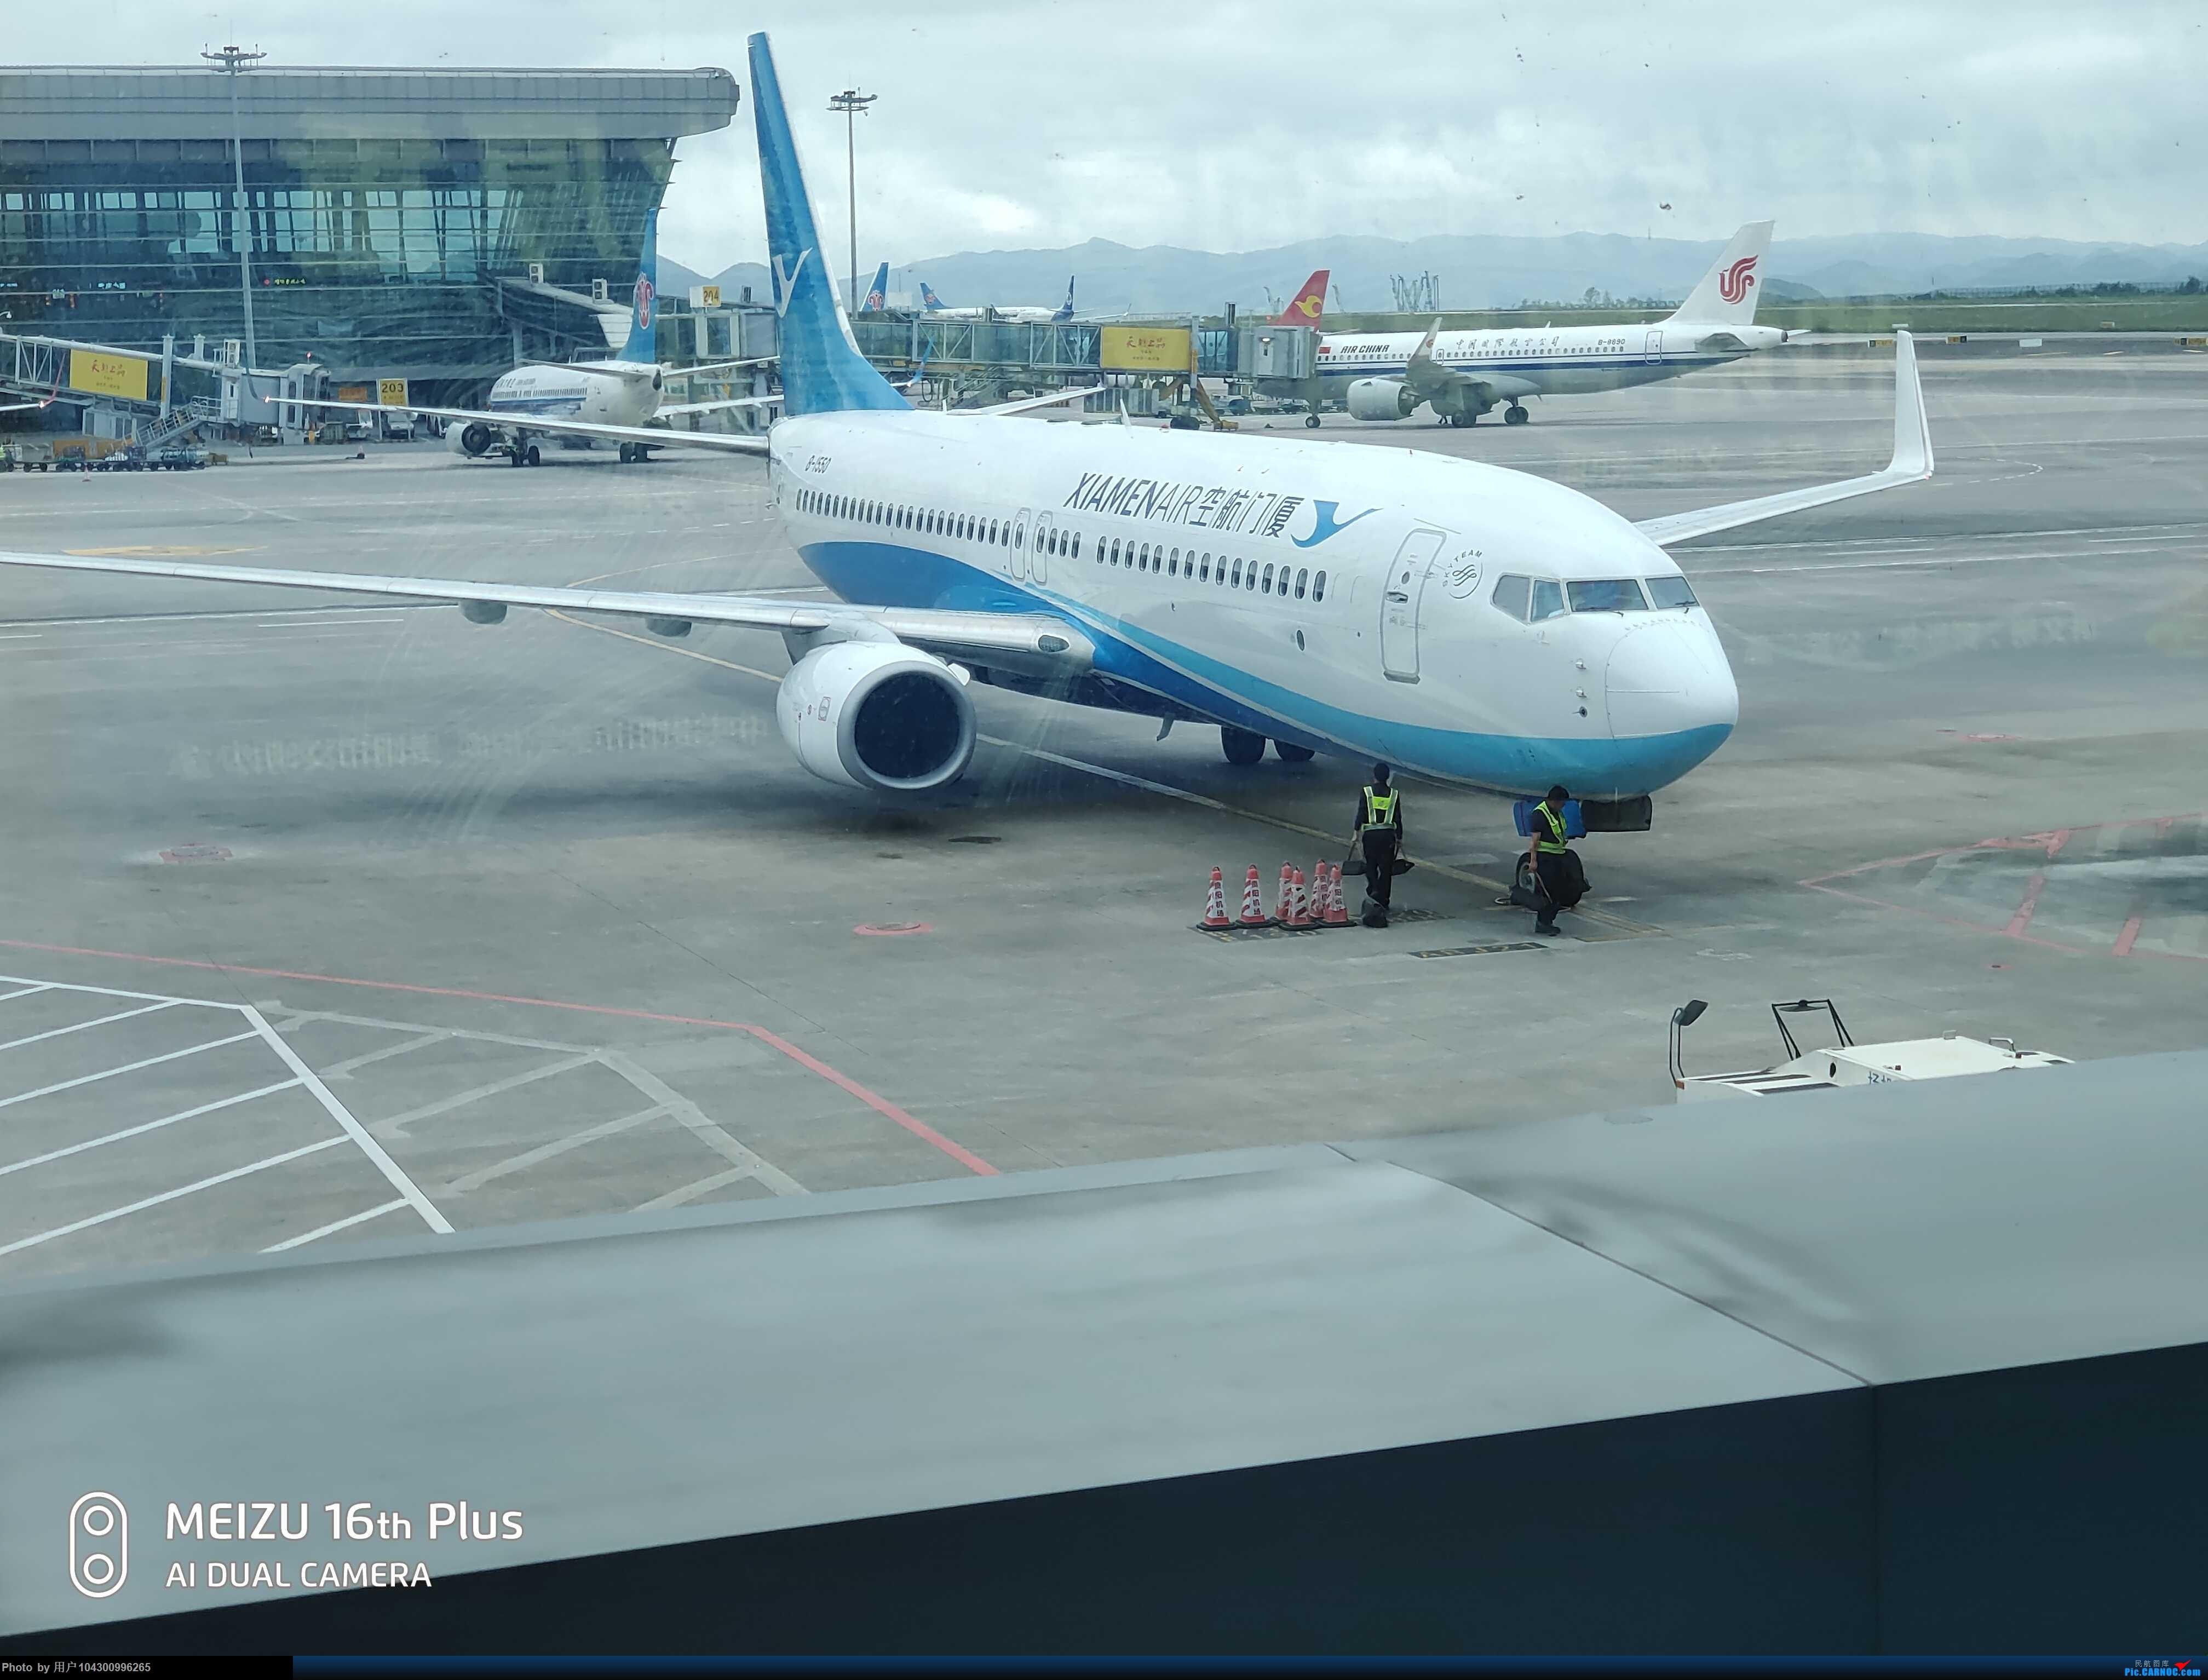 Re:[原创][DM哥飞行游记]-多彩贵州航空贵阳-茅台当日往返 BOEING 737-800 B-1550 中国贵阳龙洞堡国际机场